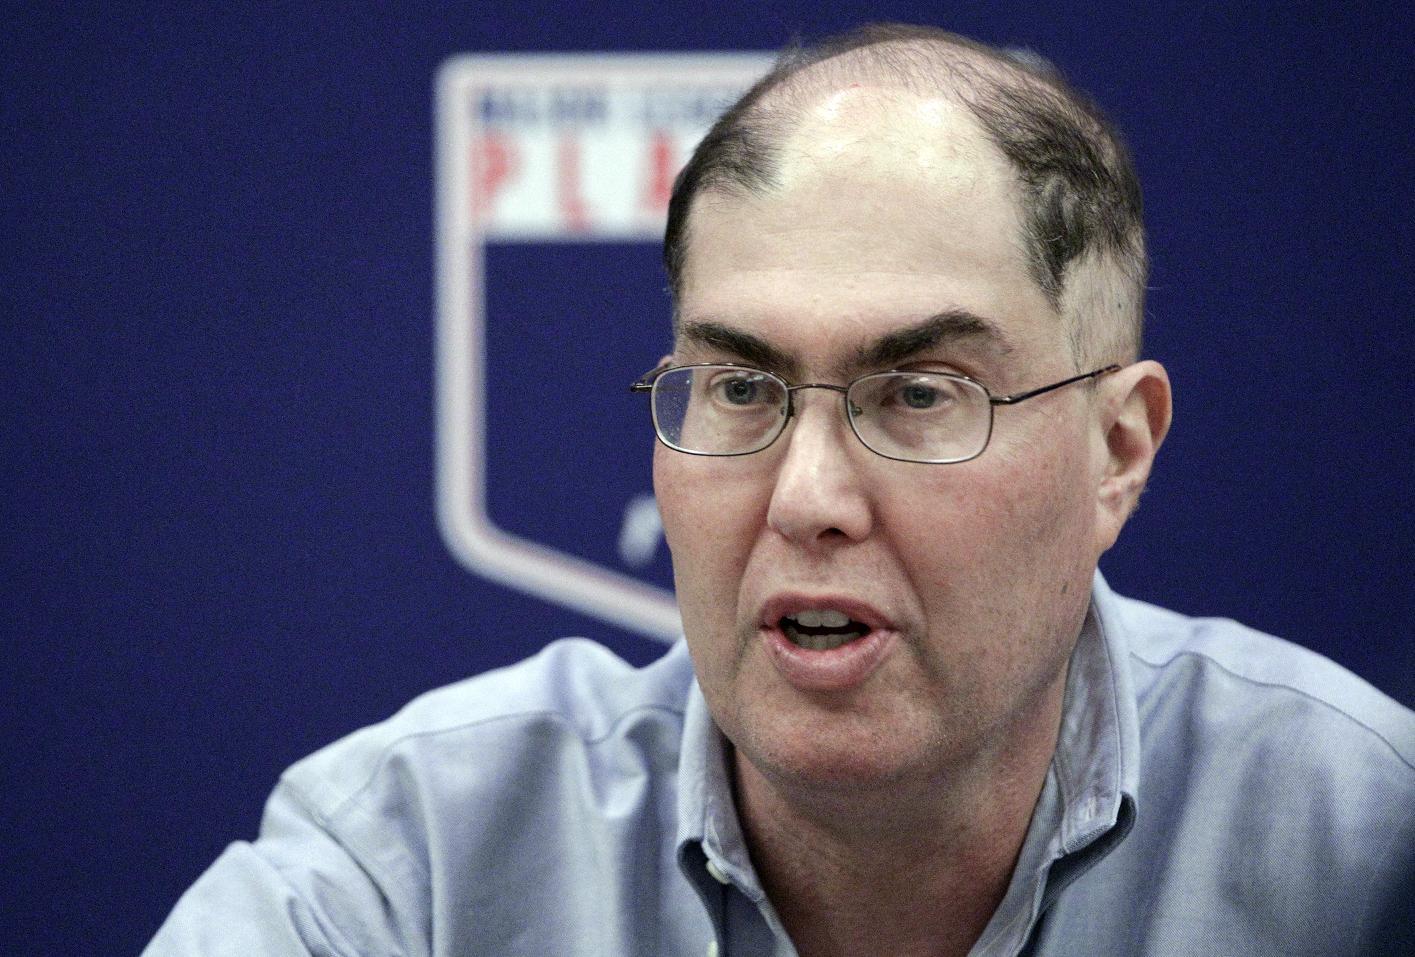 MLB players' union head Michael Weiner dies at 51